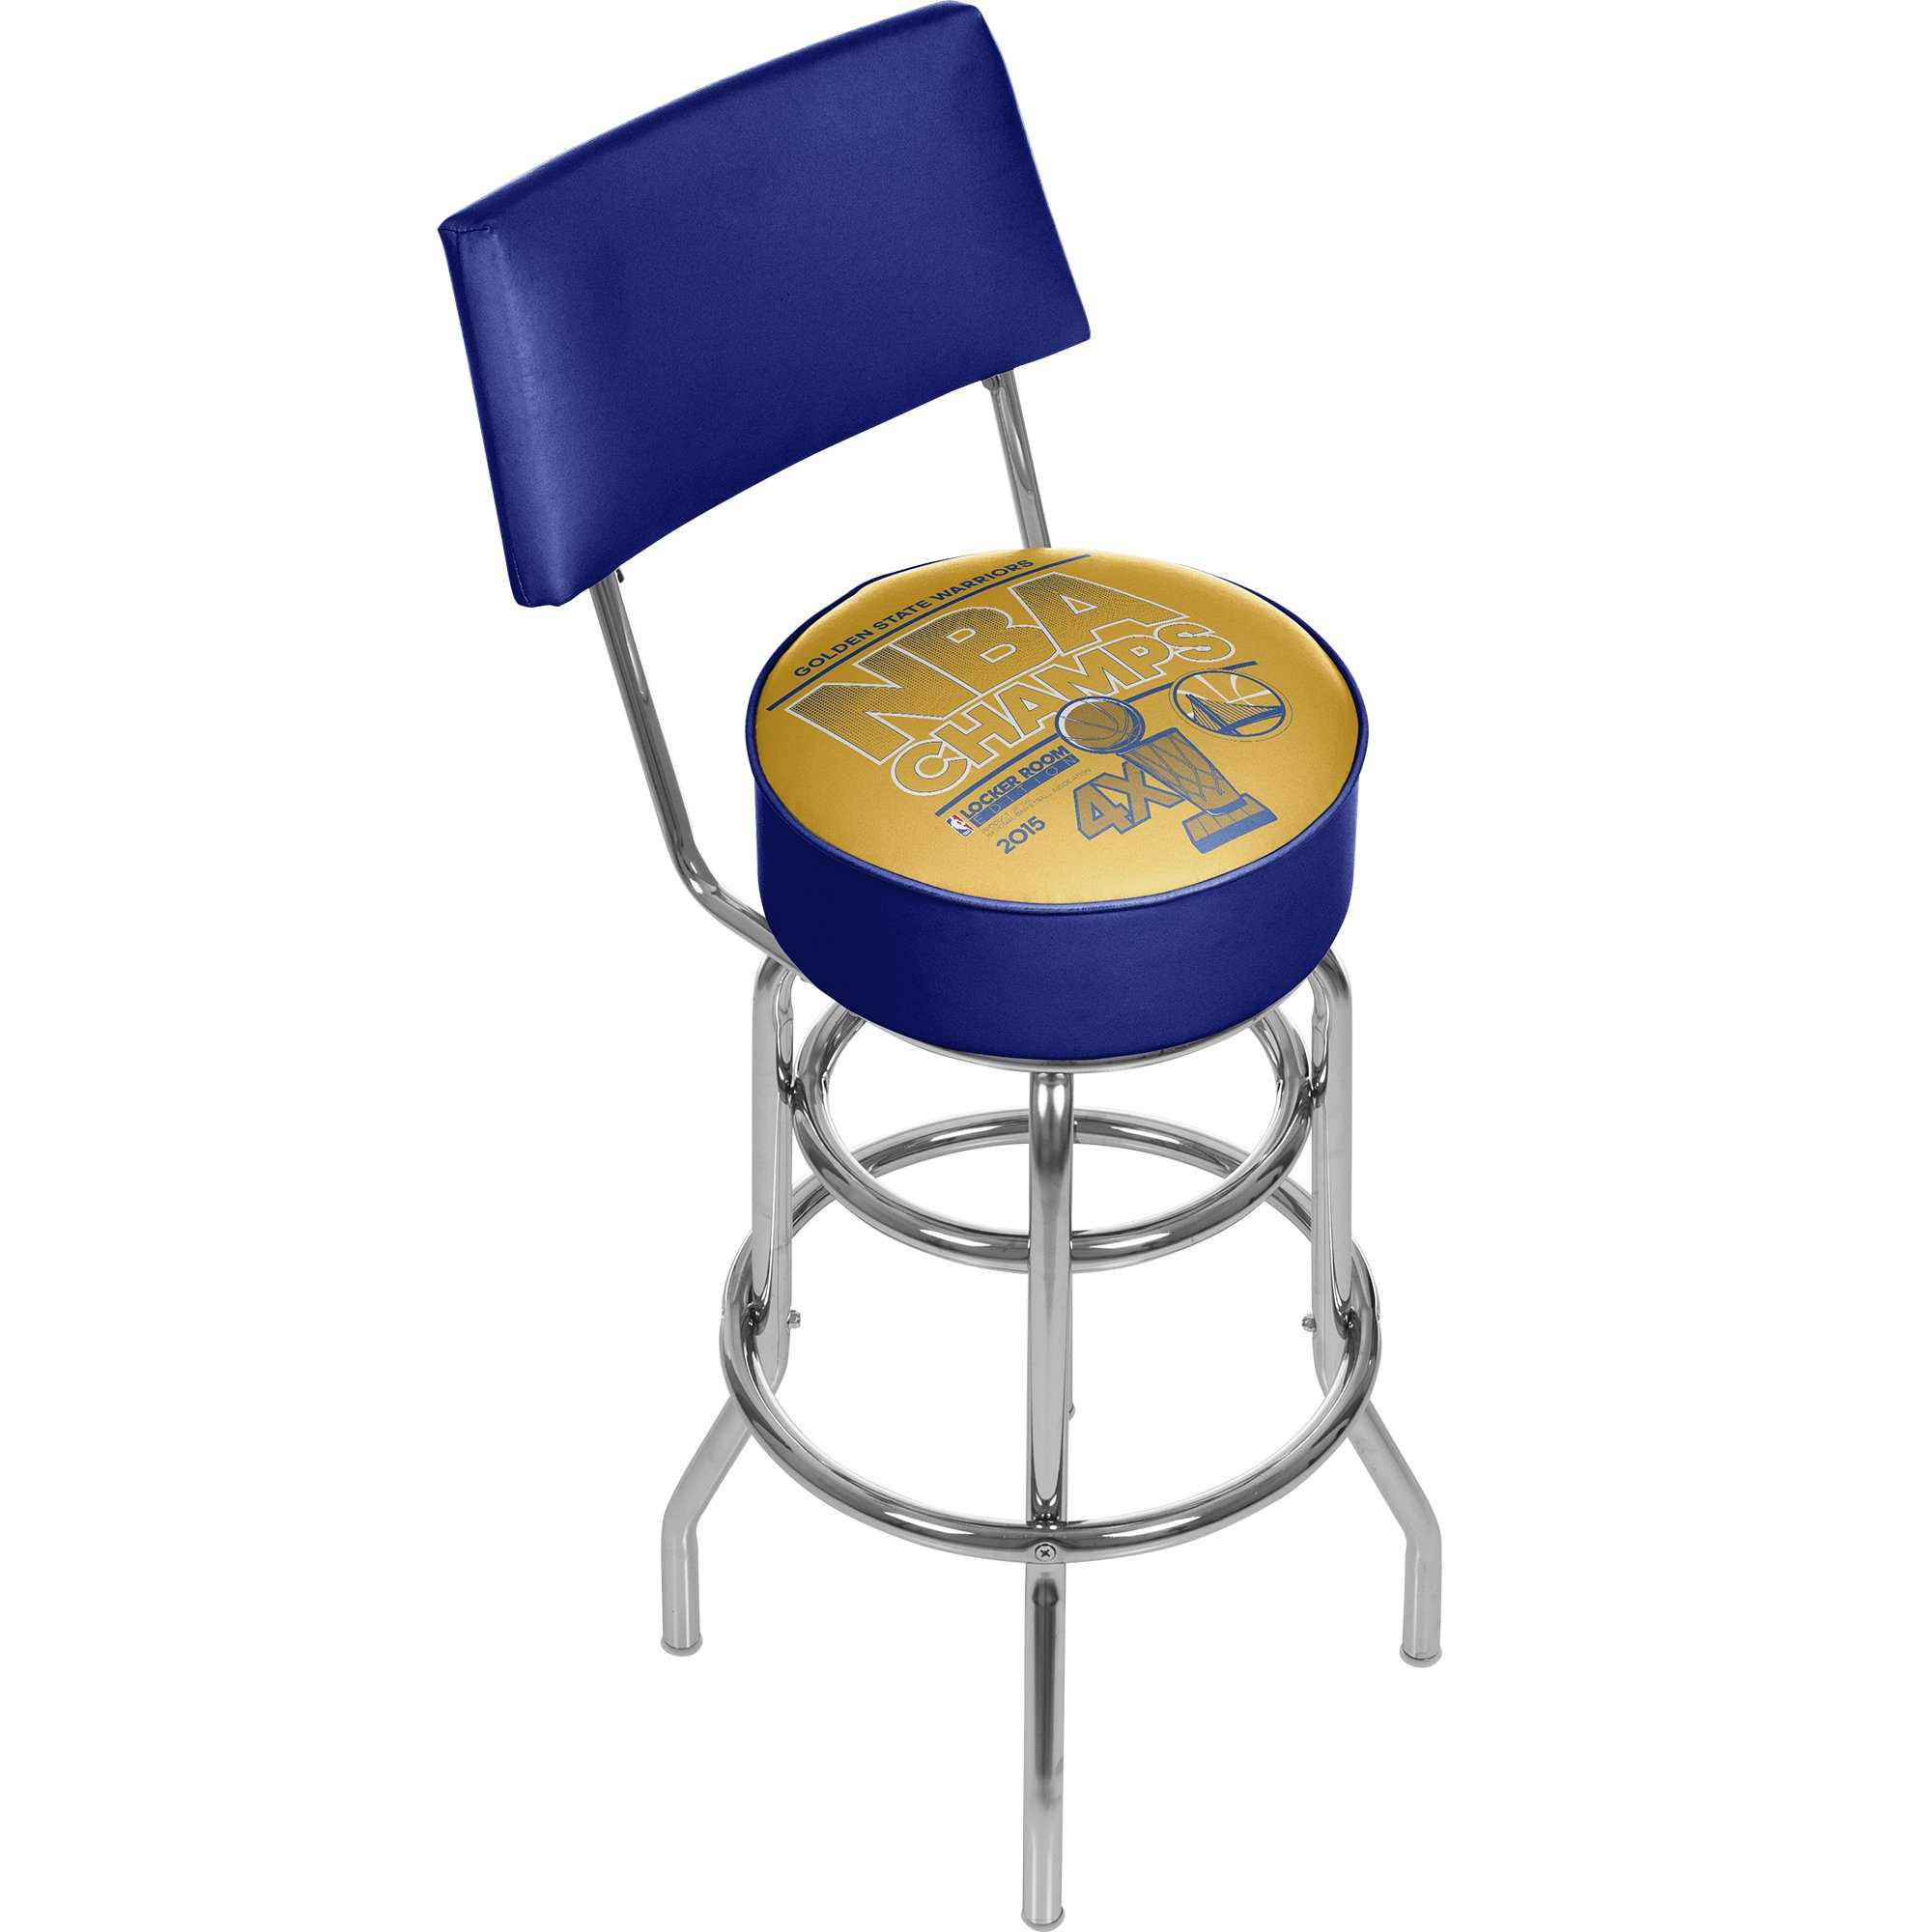 Trademark Gameroom 2015 NBA Champs Golden State Warrior Swivel Bar Stool with Back